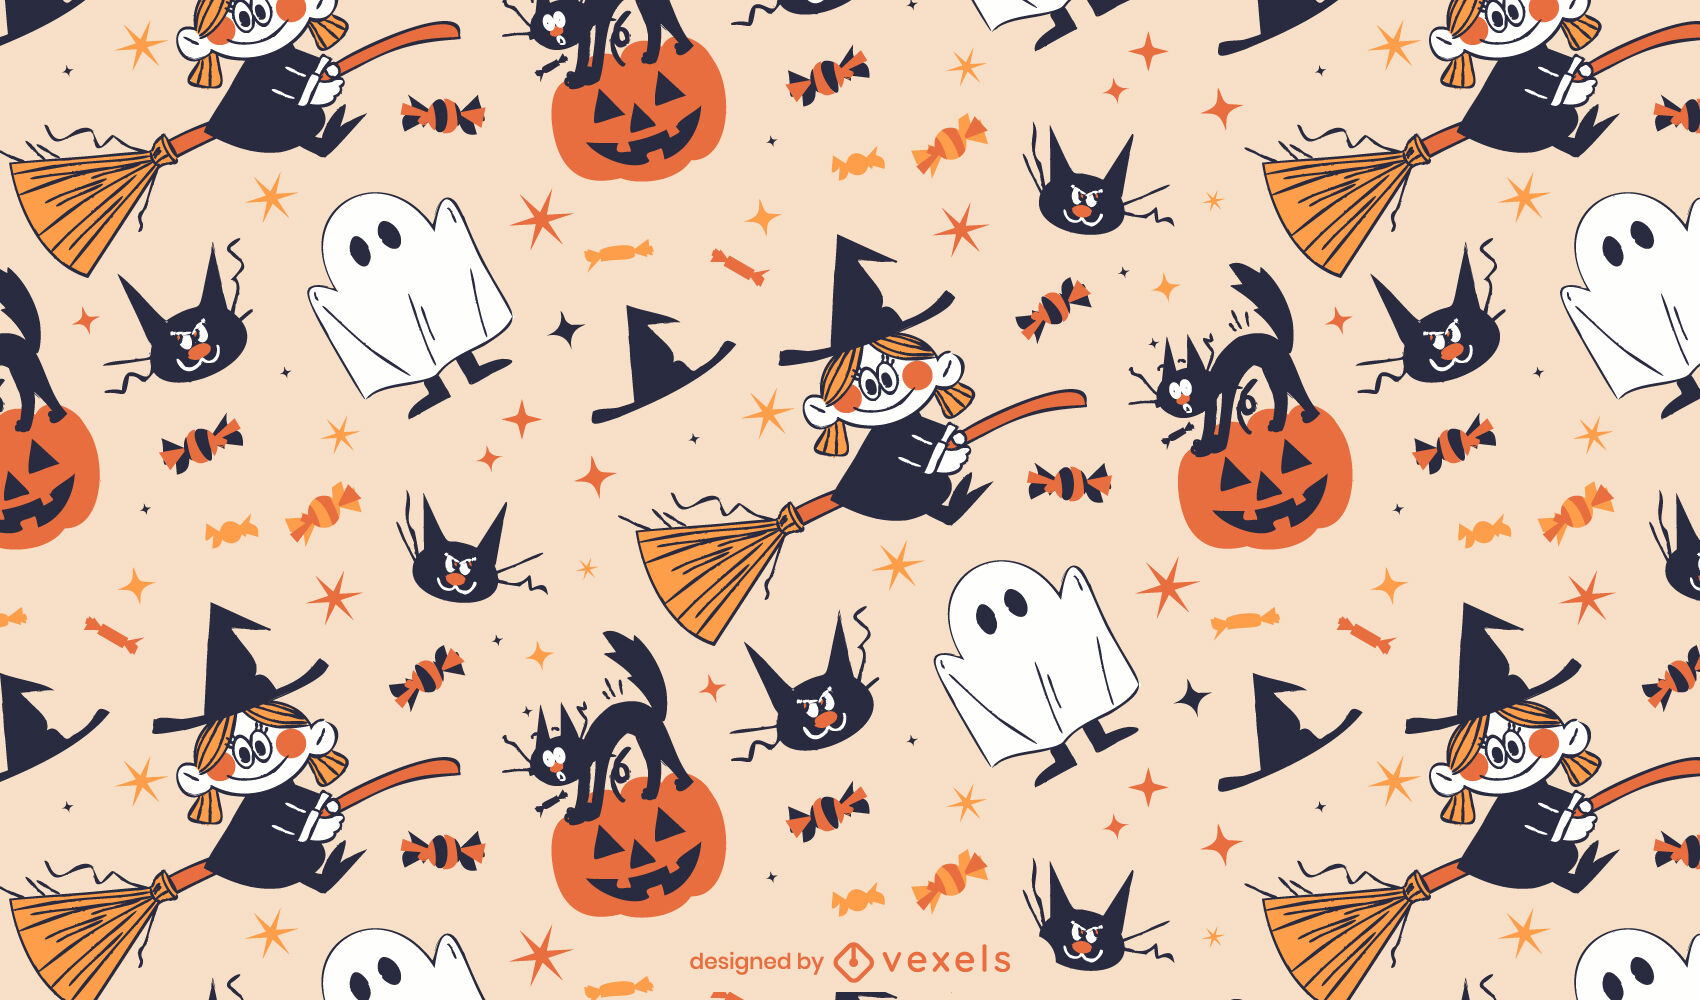 Patr?n de dibujos animados retro de Halloween